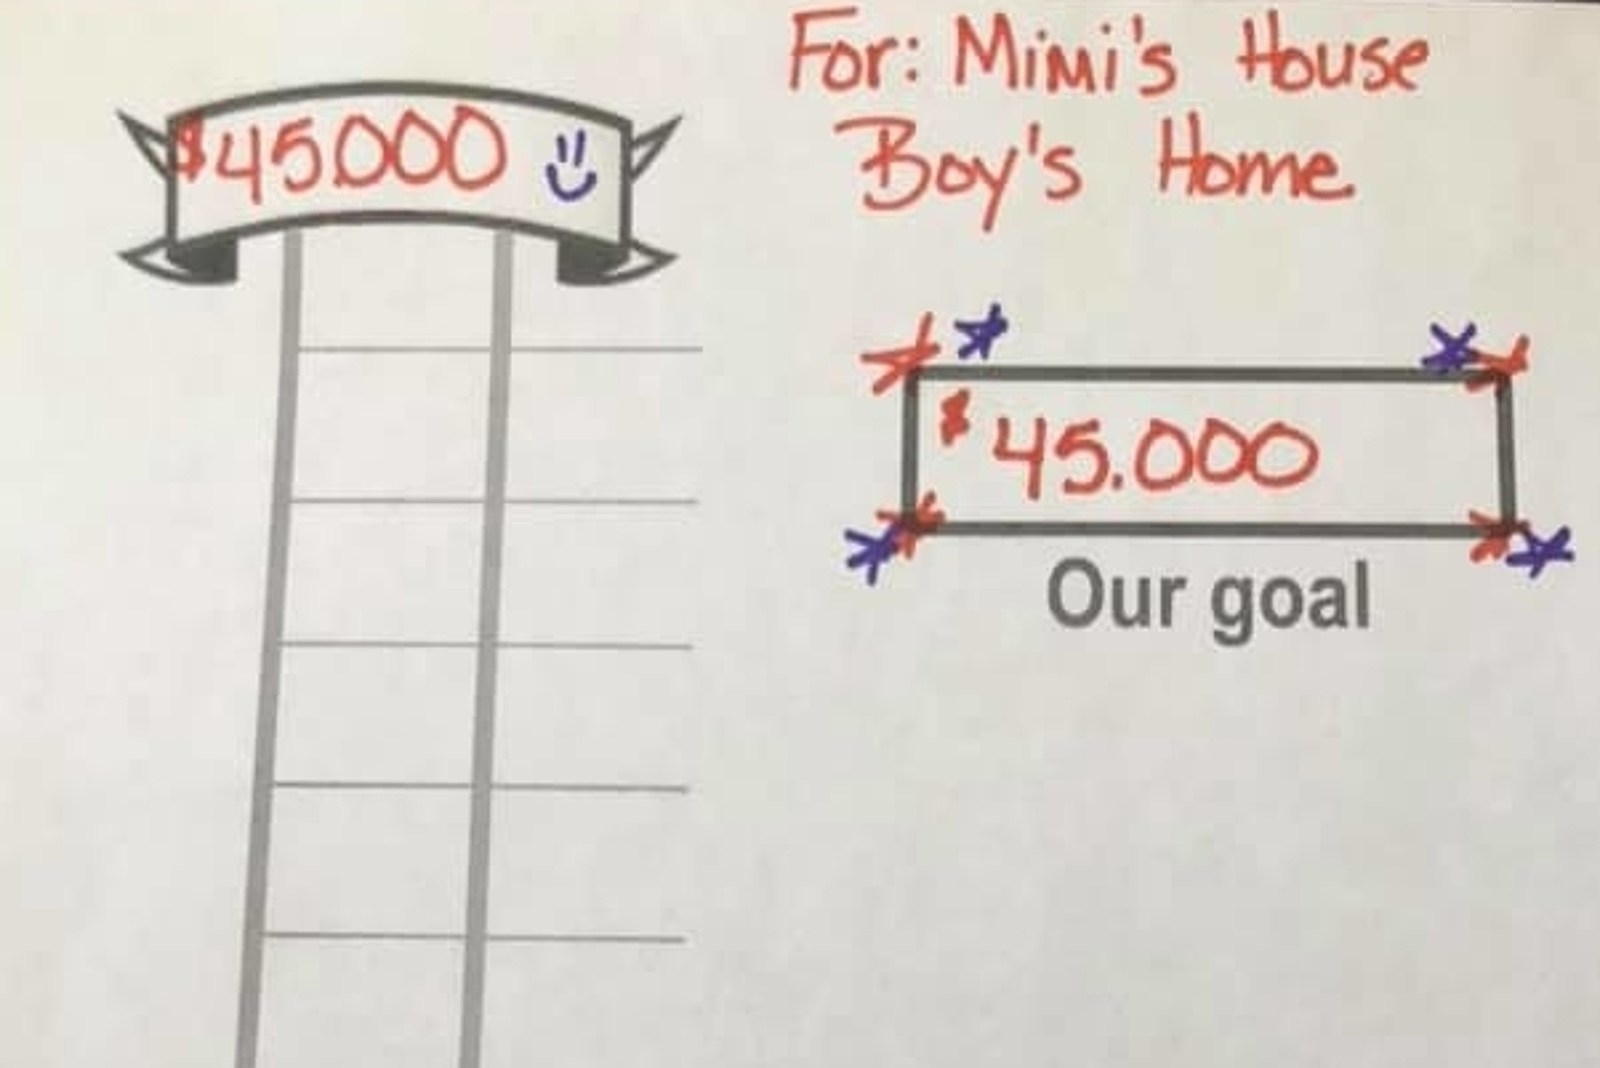 Casper Non-Profit Seeks $45,000 to Open Home for Homeless Teens